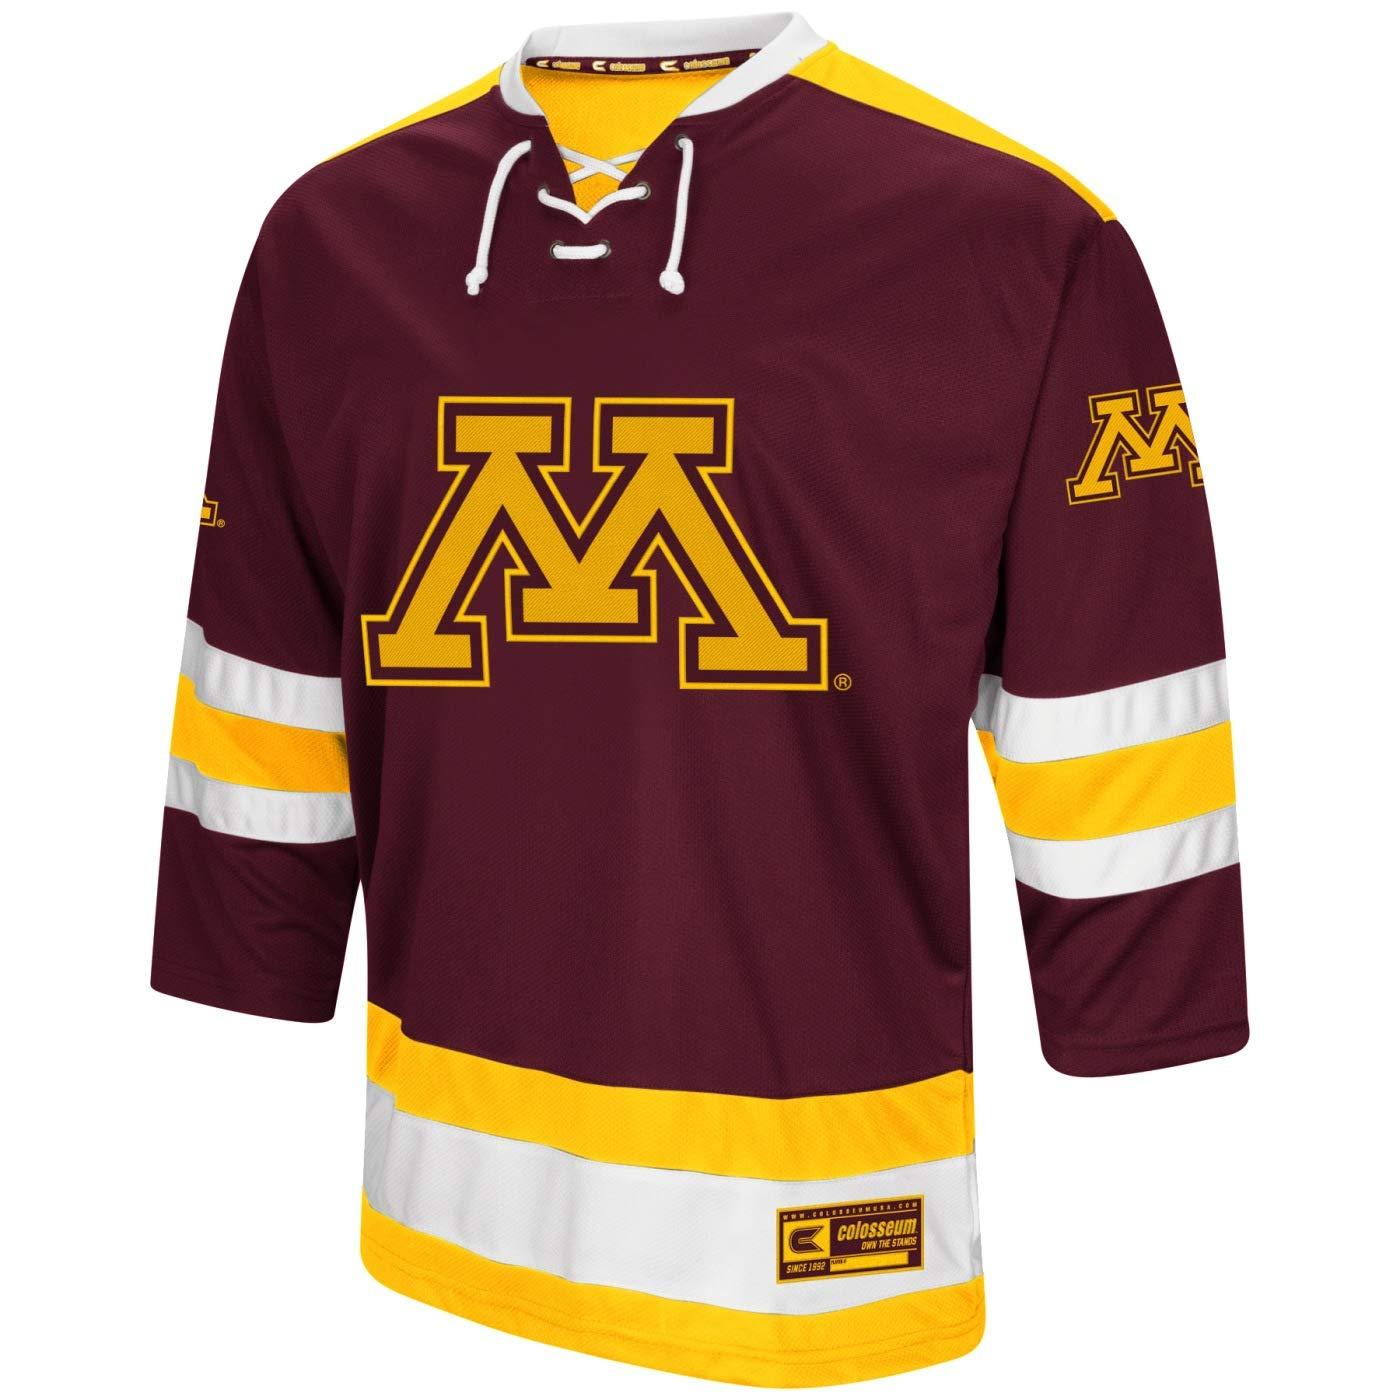 wholesale dealer cfb7e c390b Amazon.com : Colosseum Minnesota Golden Gophers NCAA Ice ...